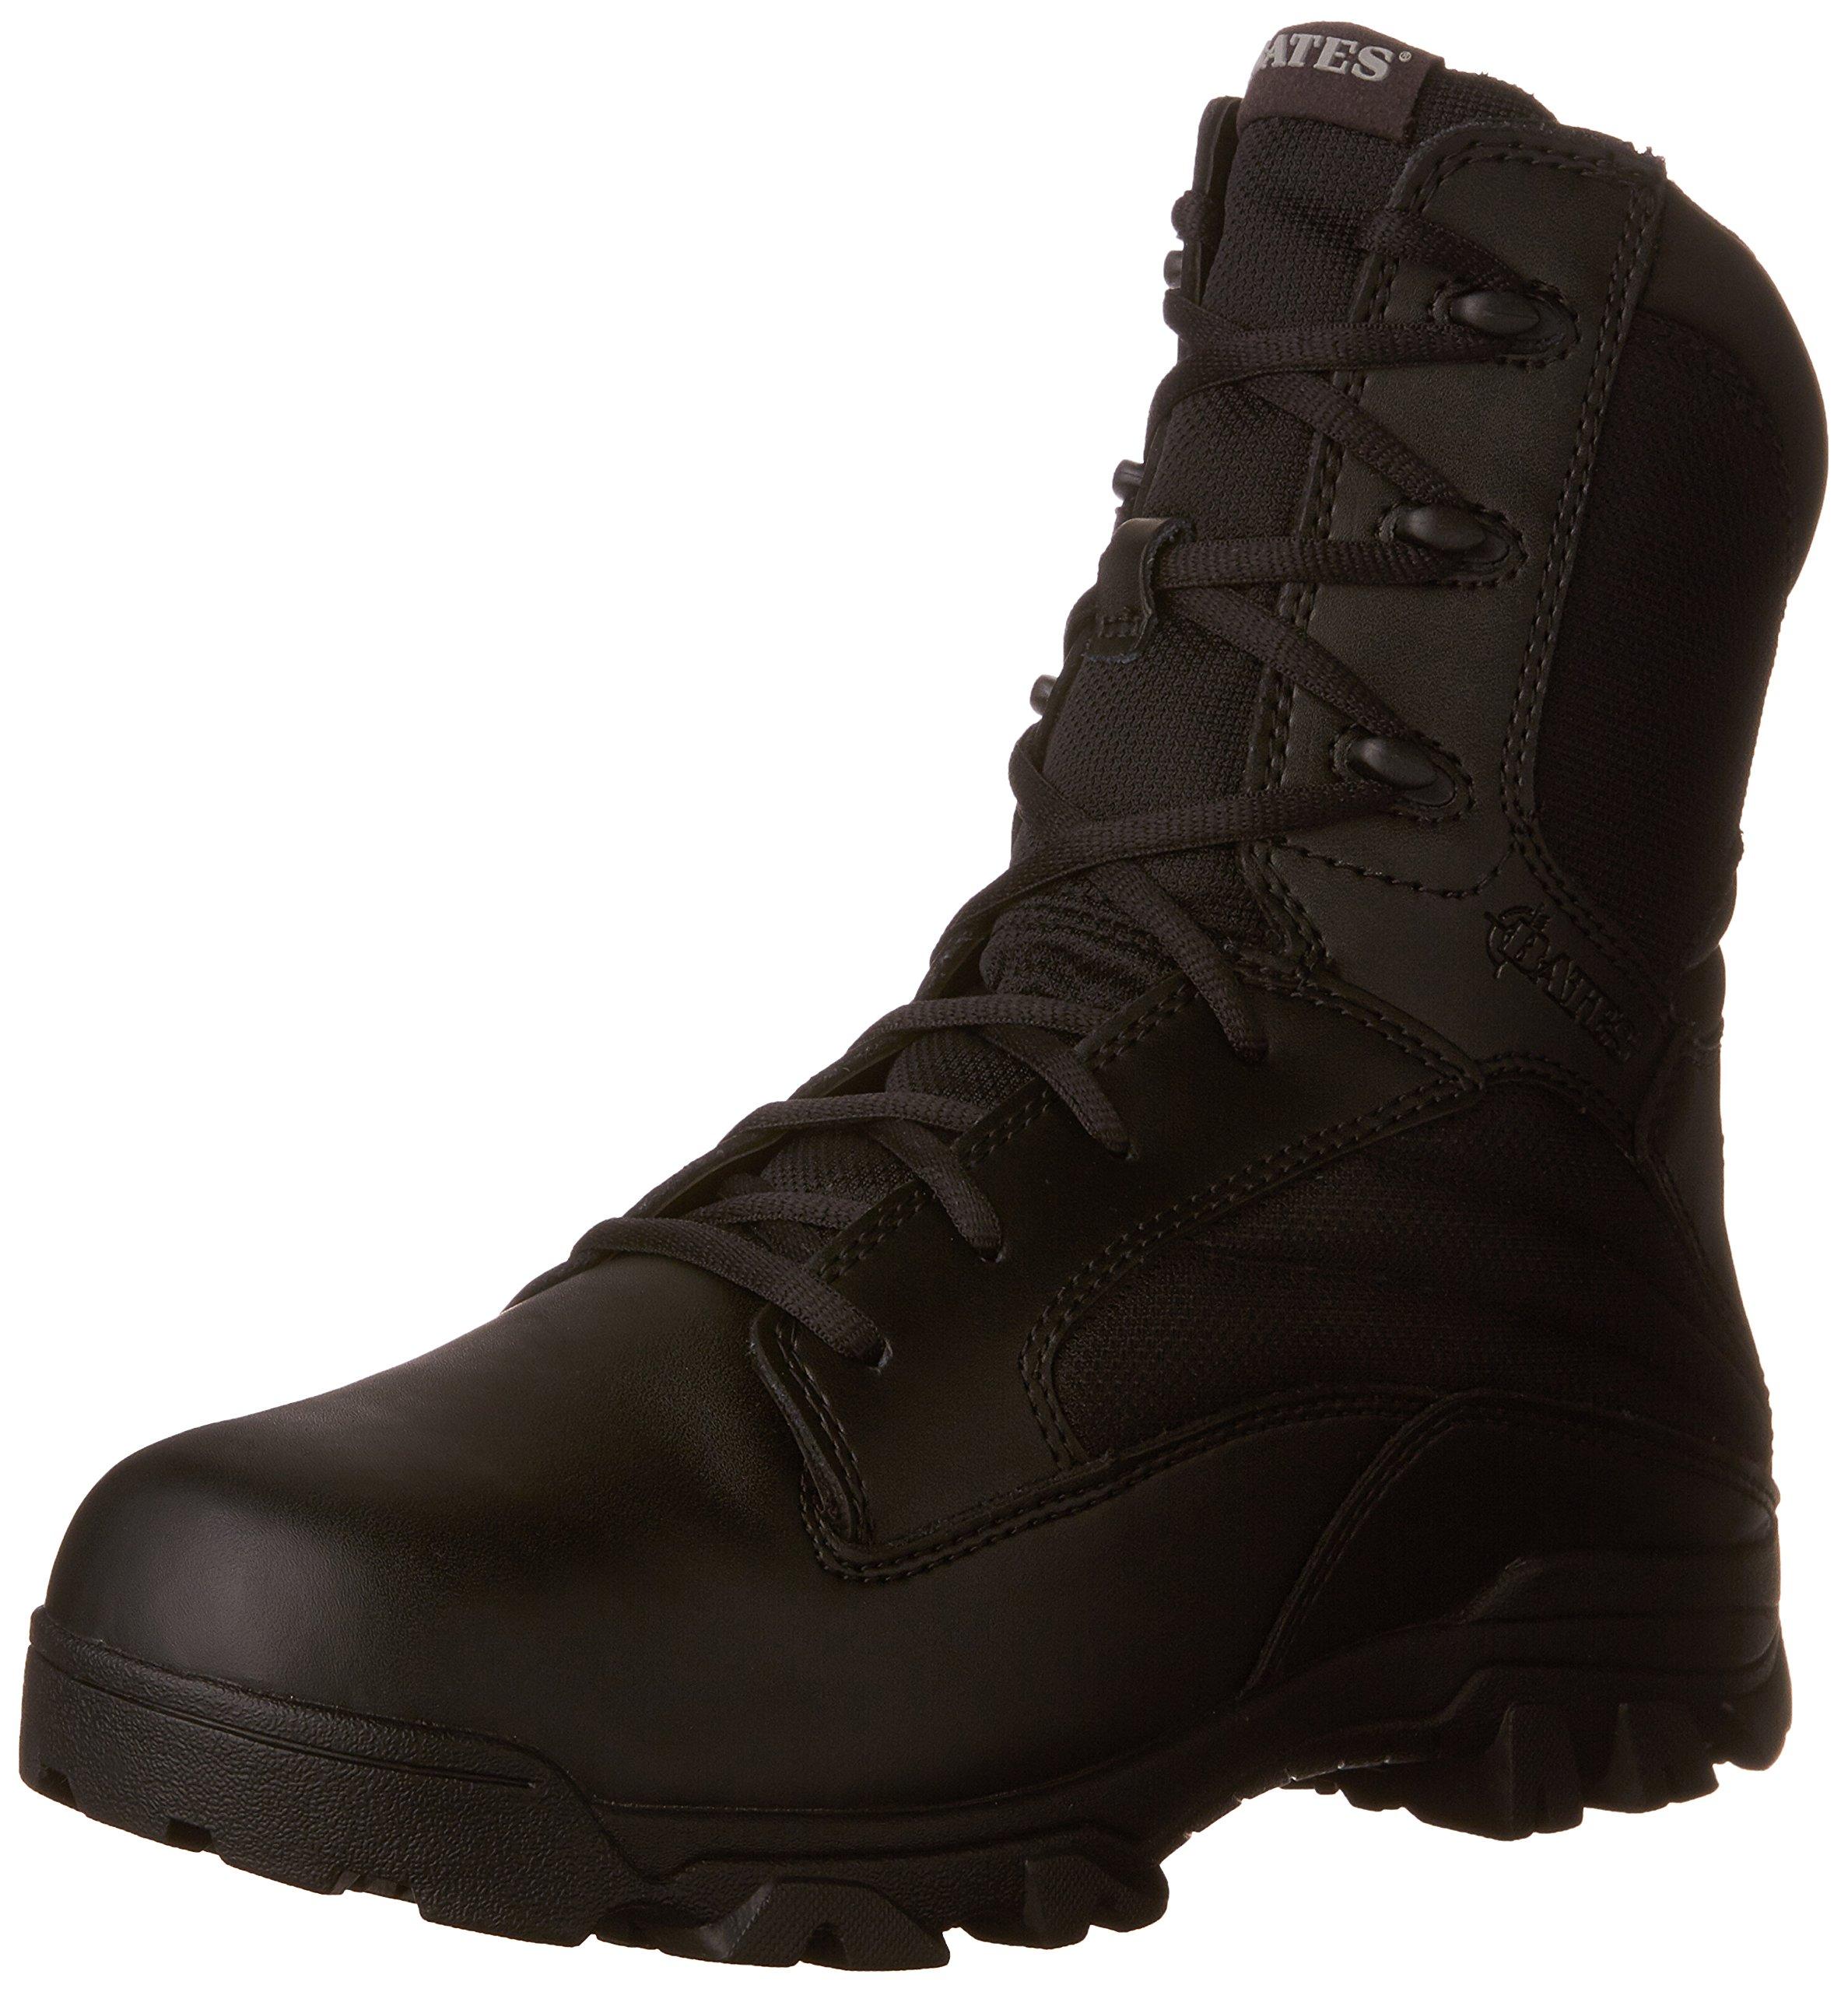 Bates Men's 8 Inch Leather Nylon Side Zip Uniform Boot, Black, 9 M US